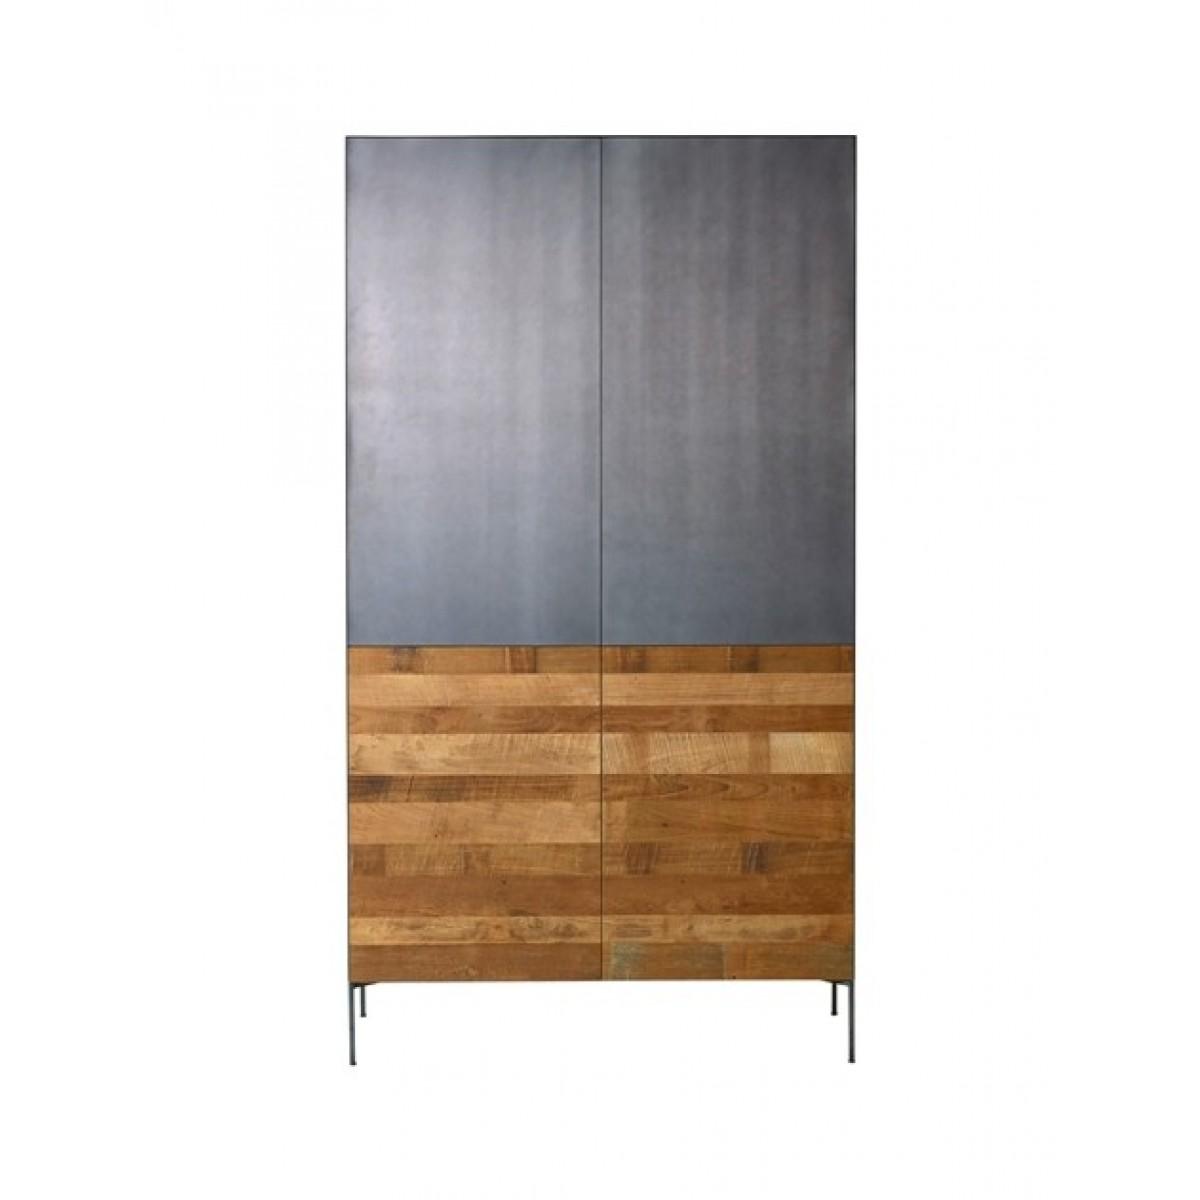 pandora-bergkast-4-deuren-metaal-teak